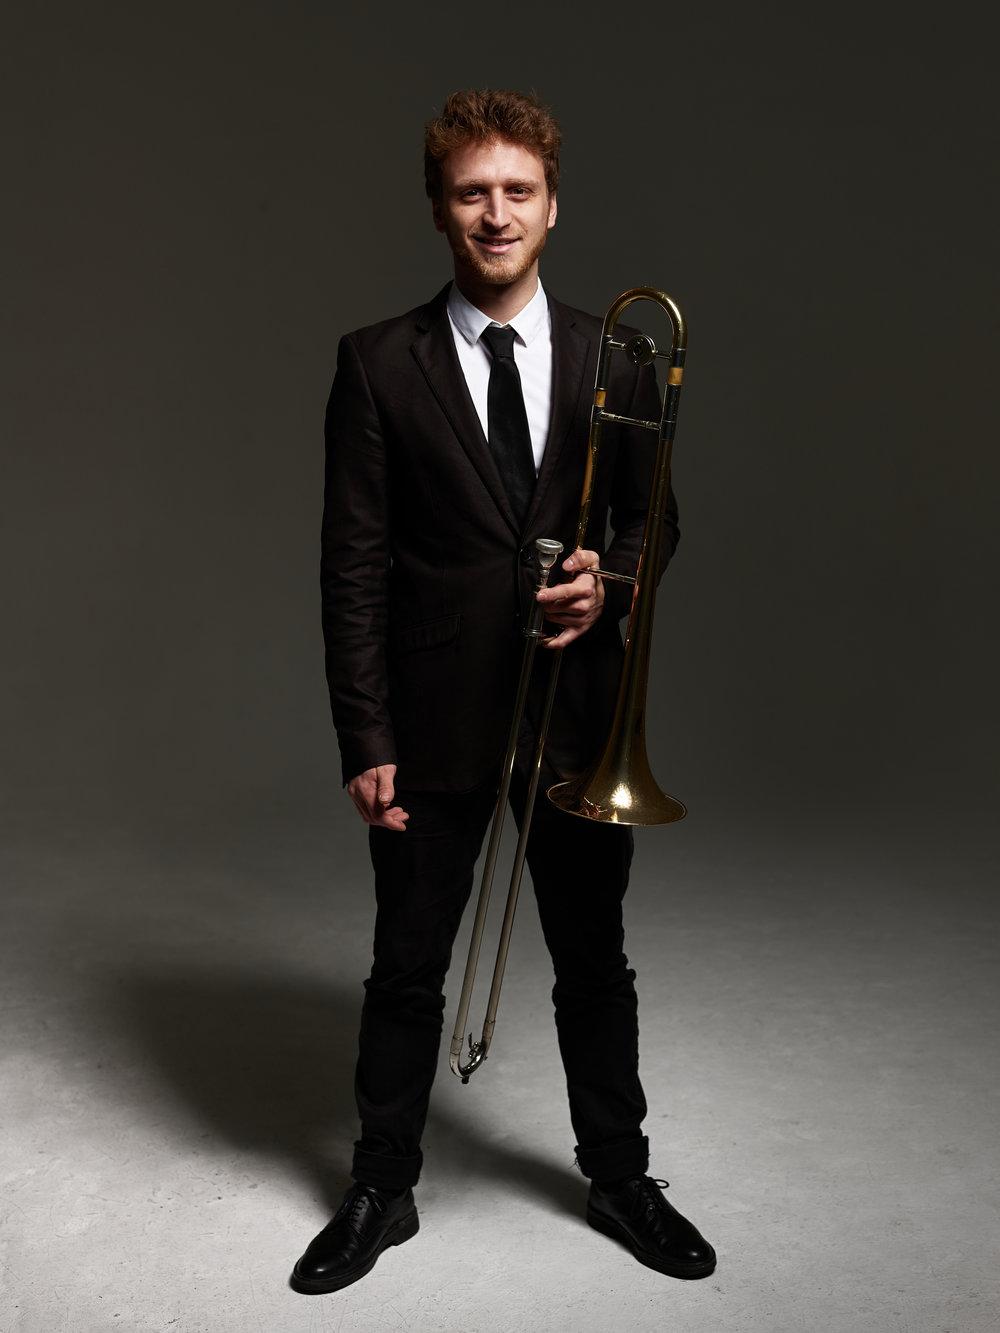 Nathan - Trombone